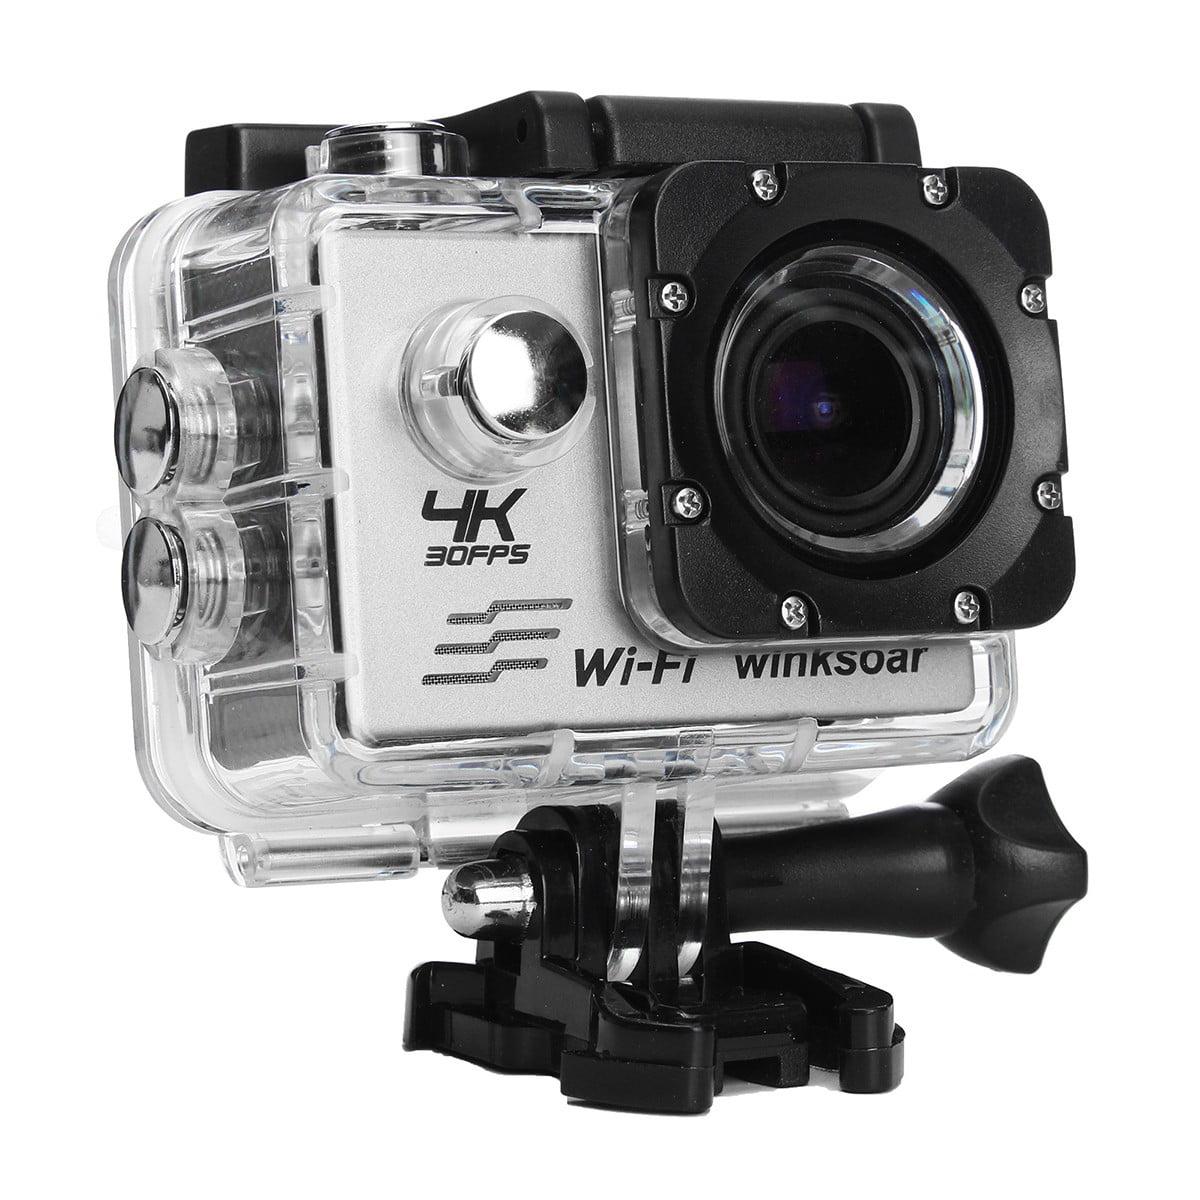 Winksoar SJ9000 Sports Action Camera WiFi HD 4K 1080P 16MP 120° Wide-angle Mini DV Recorder DV Camcorder Waterproof New Year Christmas Gifts Kids